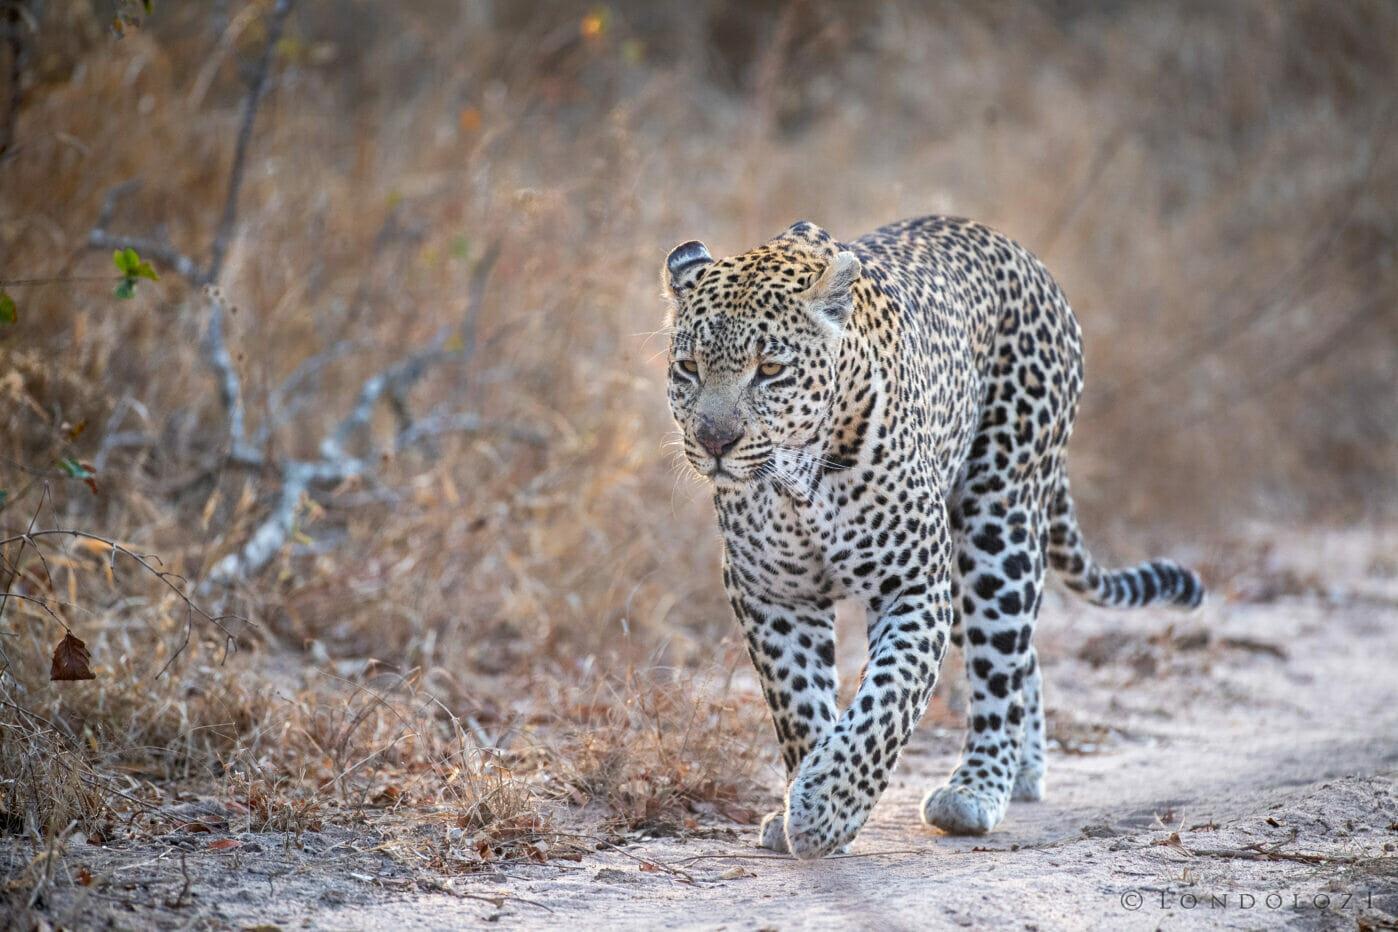 Jts Ntsumi Female Leopard